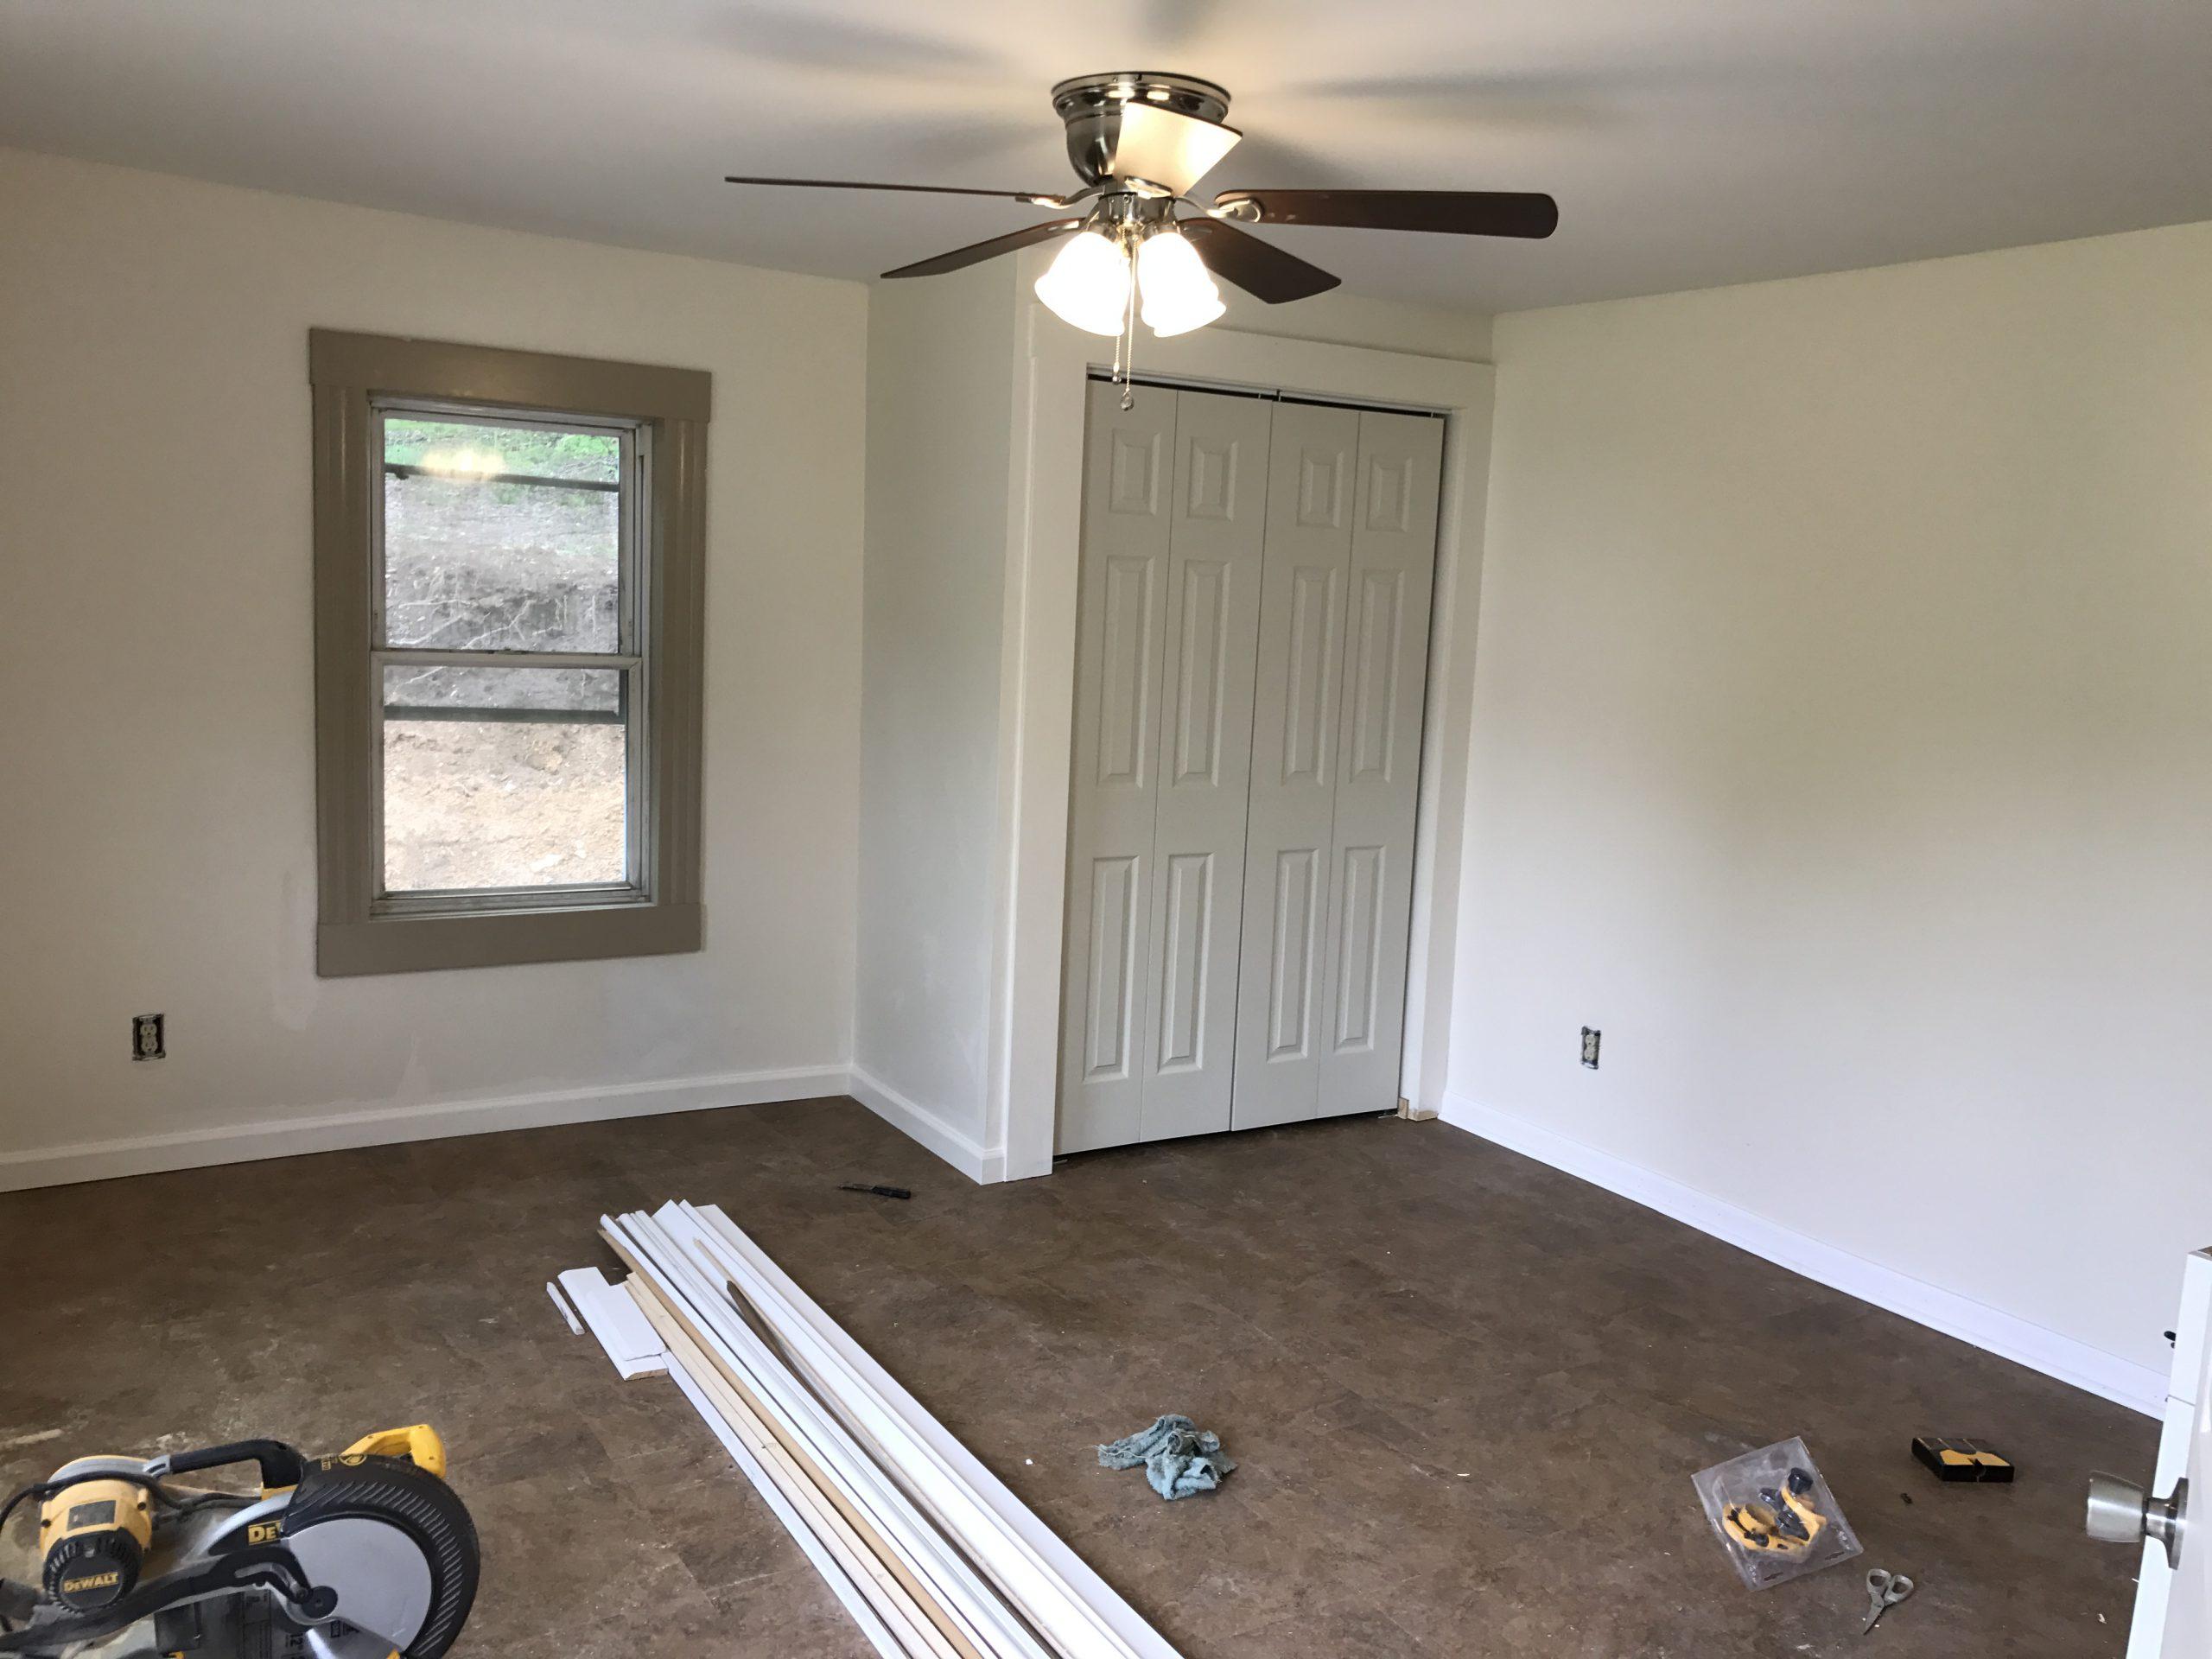 444 White Ave. Bedroom